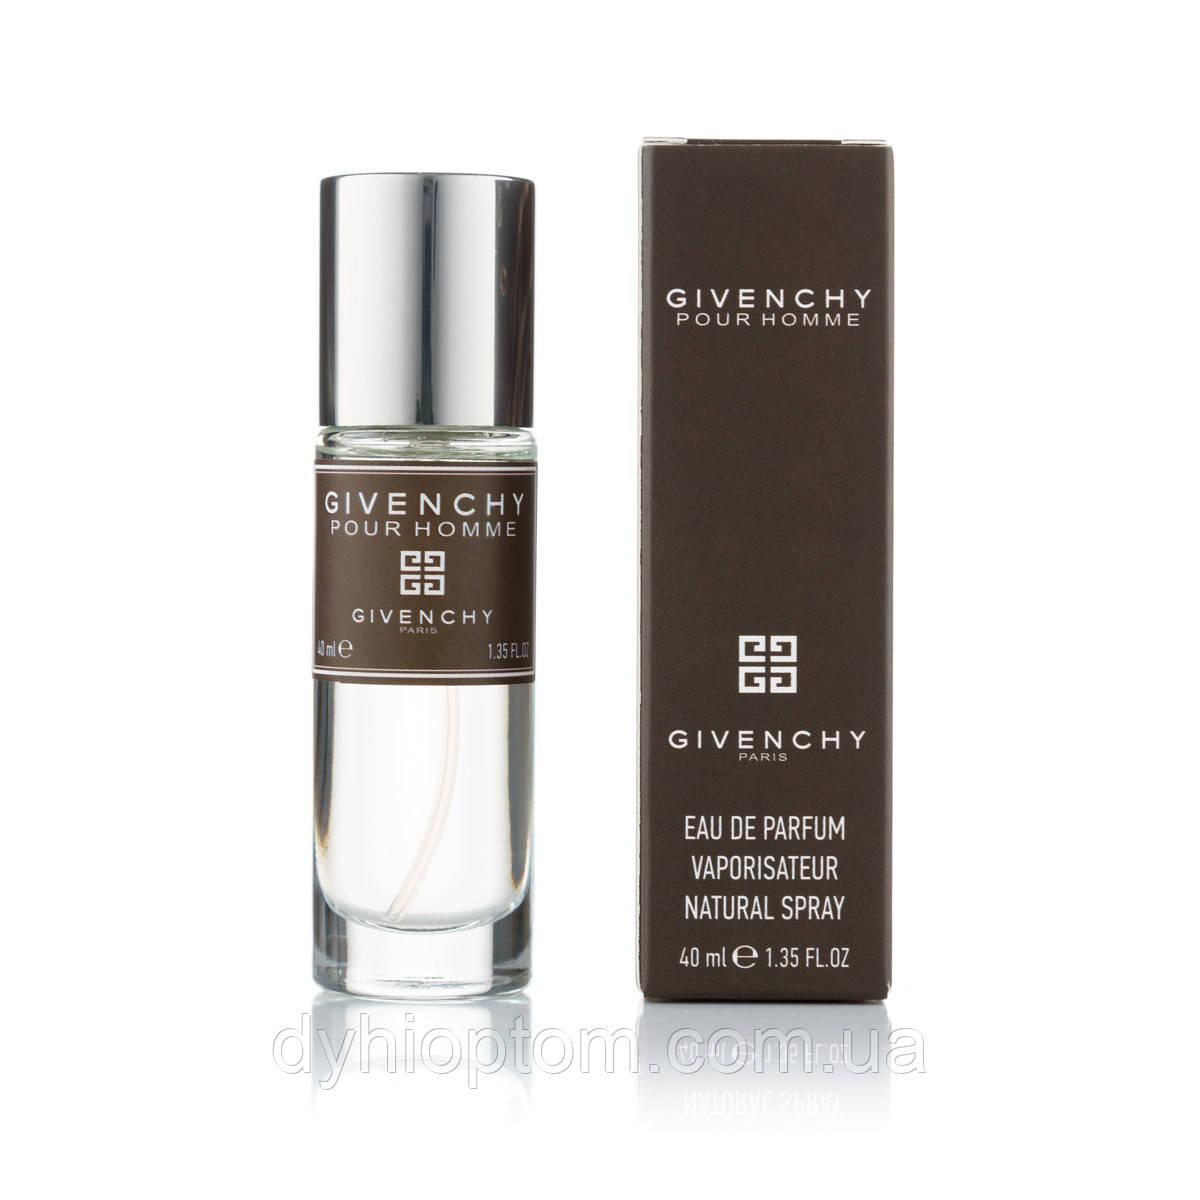 Чоловічий парфум Givenchy Pour Homme, 60 ml